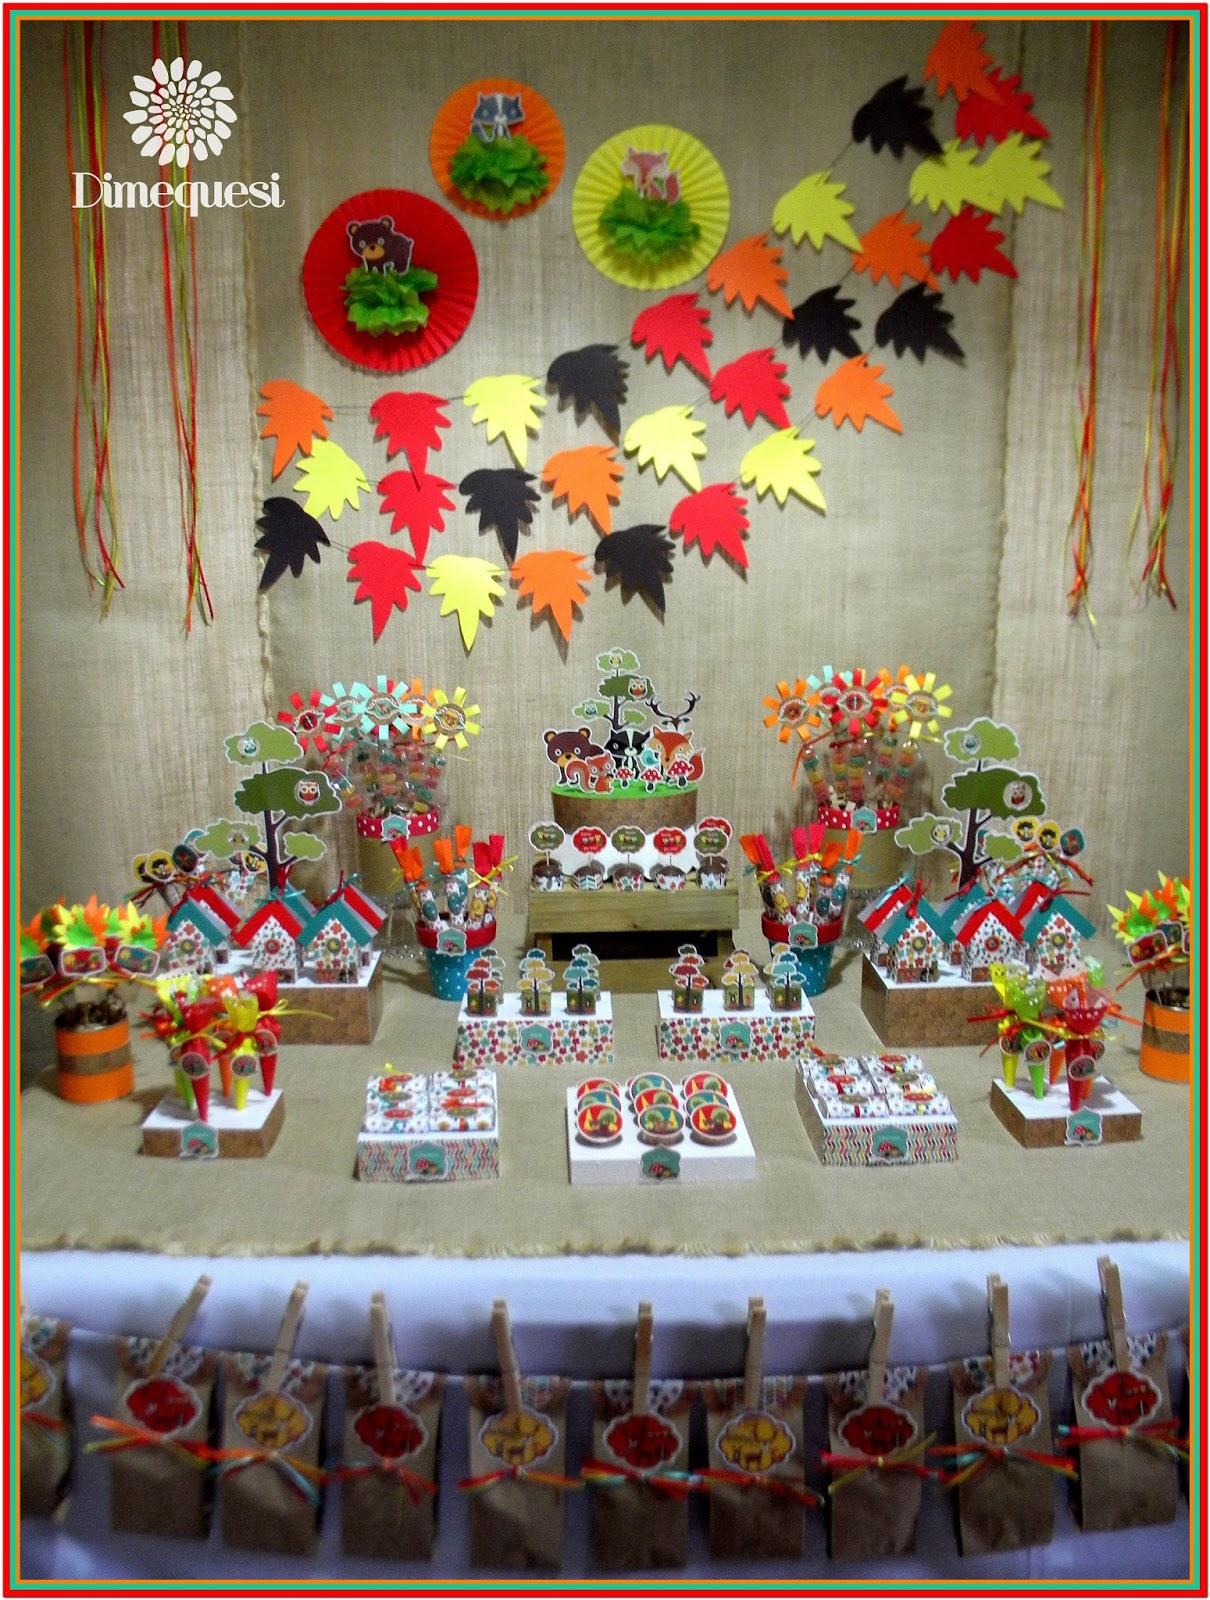 Dimequesi Fiesta En El Bosque Imprimible Gratis Woodland Party